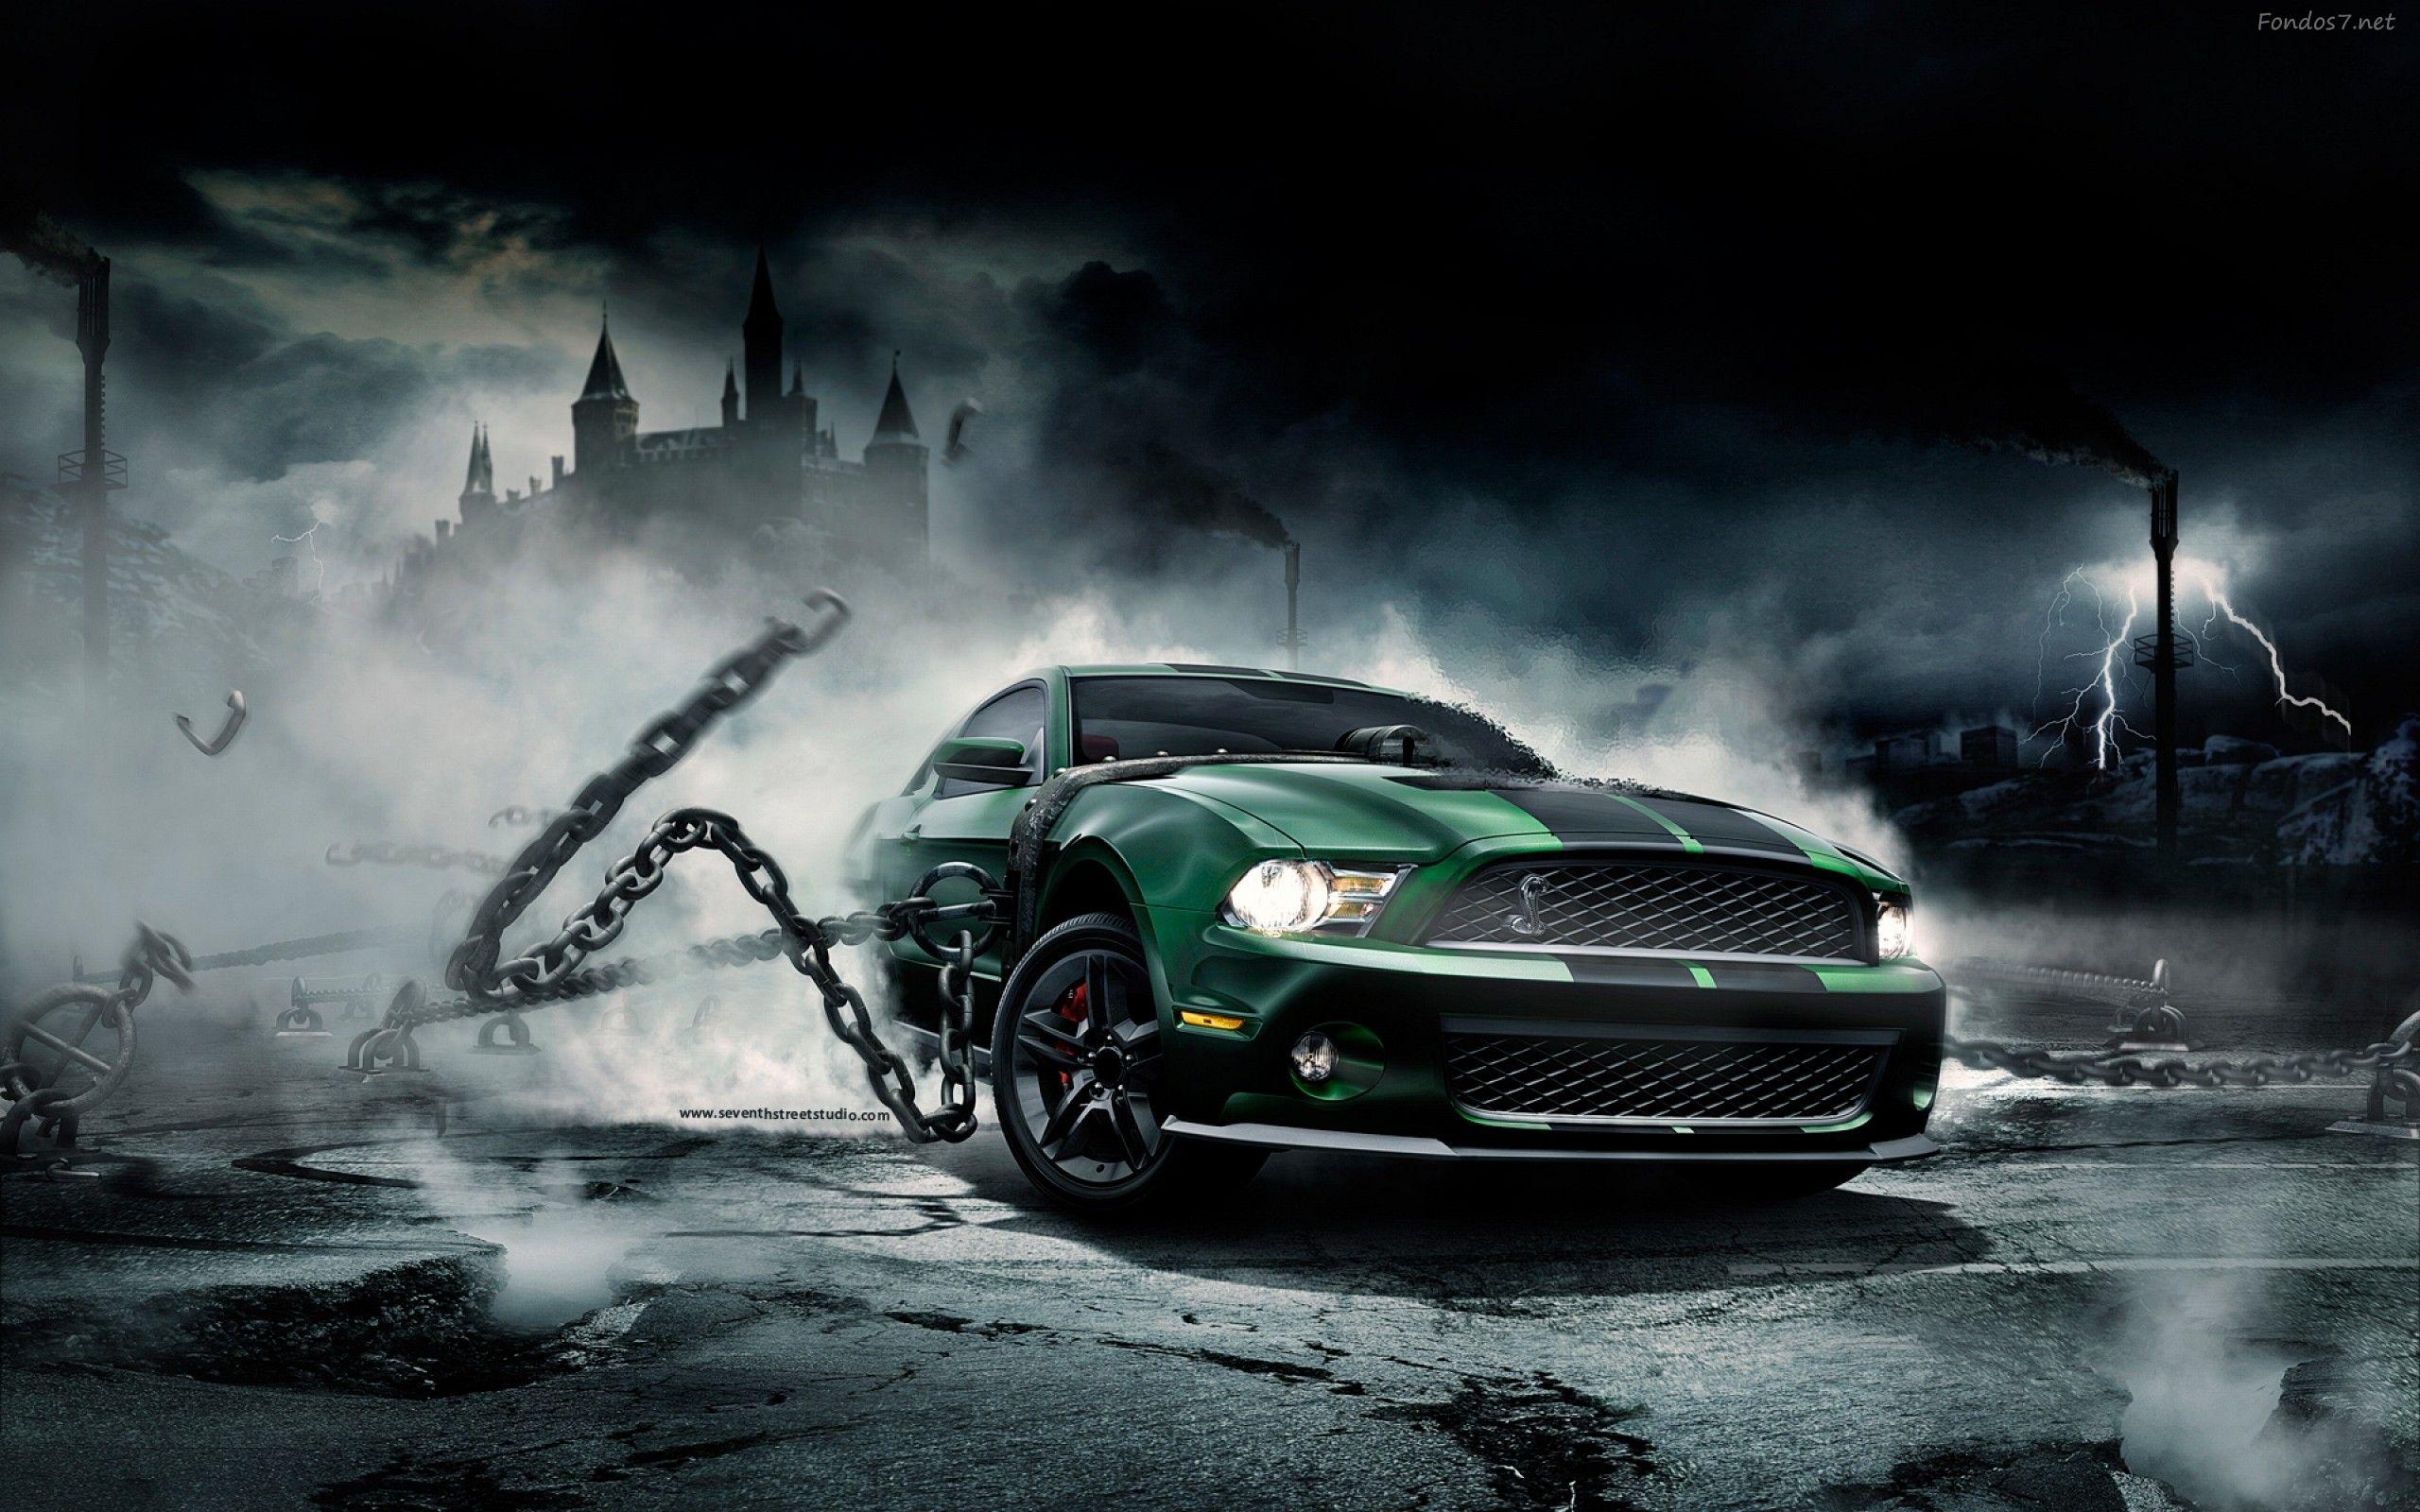 Download Autos Wallpaper Gallery Mustang Wallpaper Ford Mustang Wallpaper Car Backgrounds